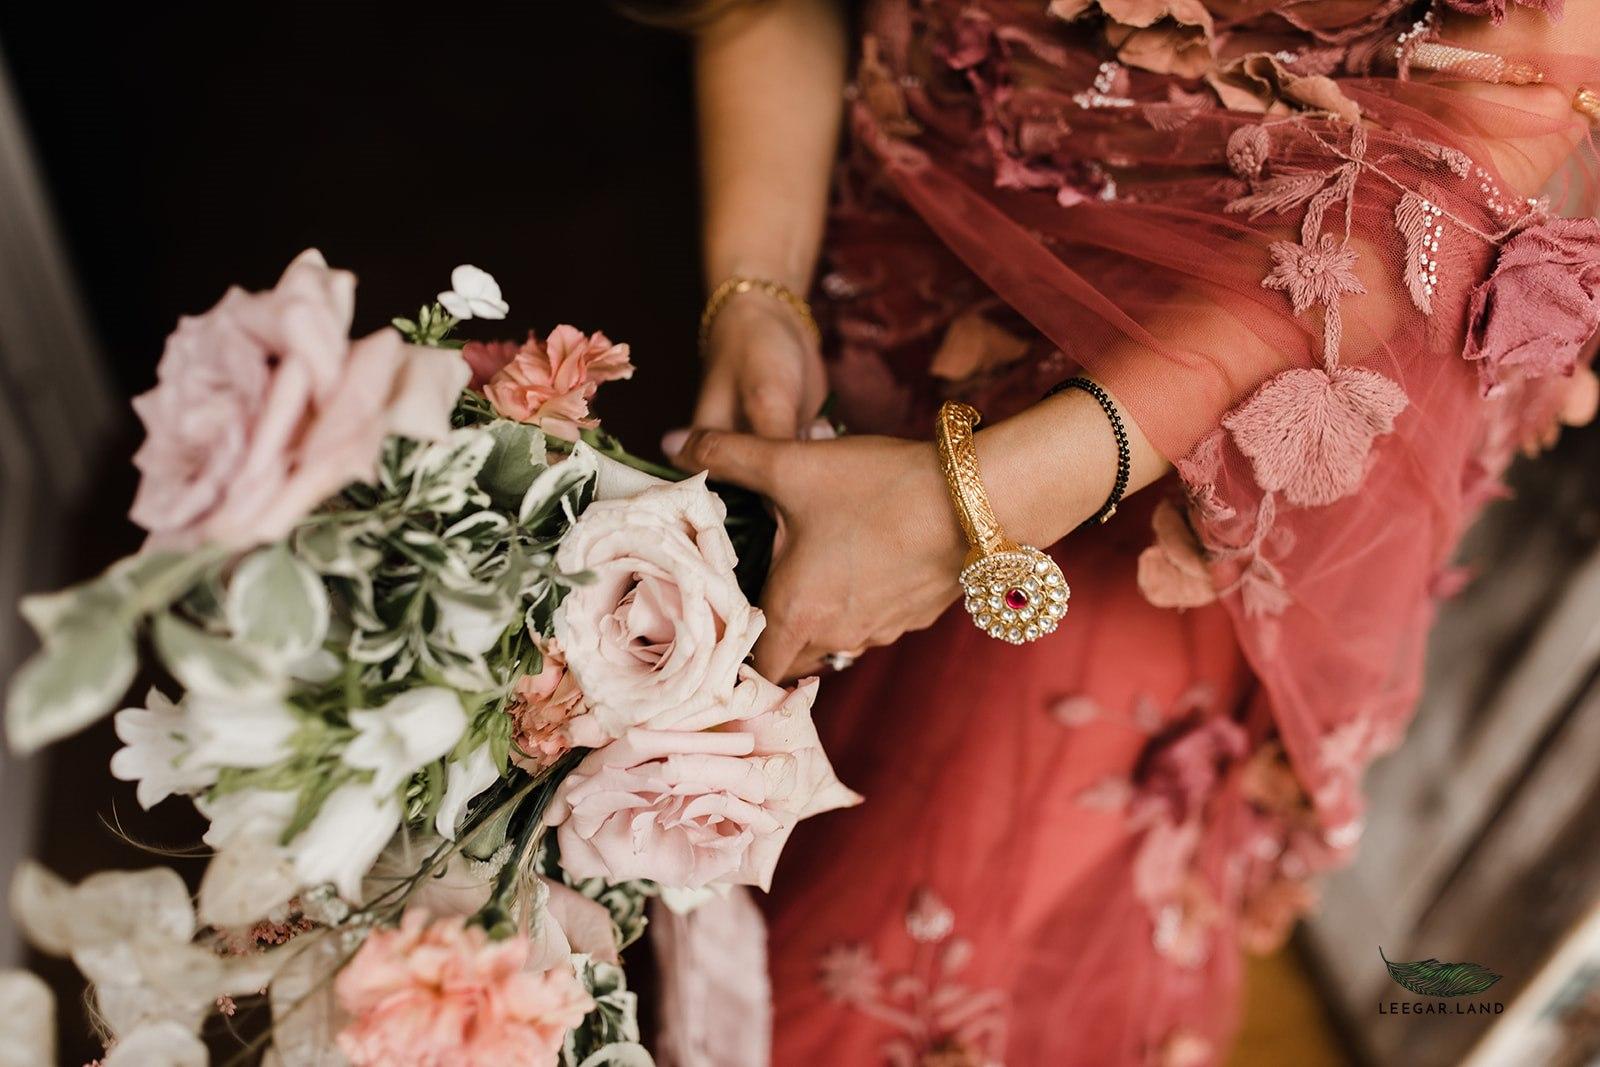 Wedding flowers by boho wedding florist, Velvet Rose Flower Studio in Essex.